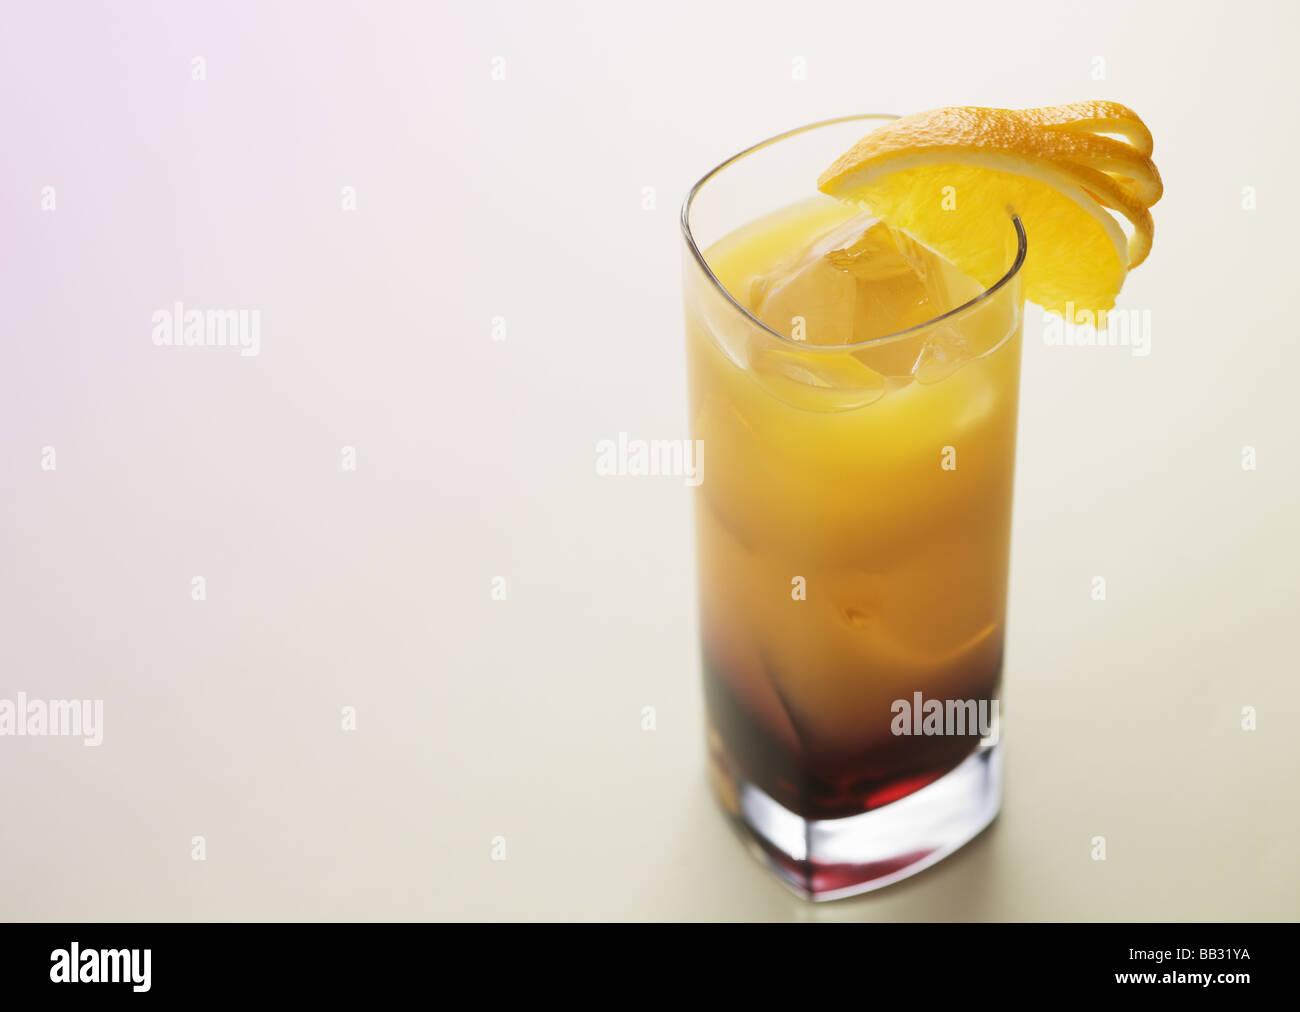 Cassis Orange Stock Photo 24038990 Alamy